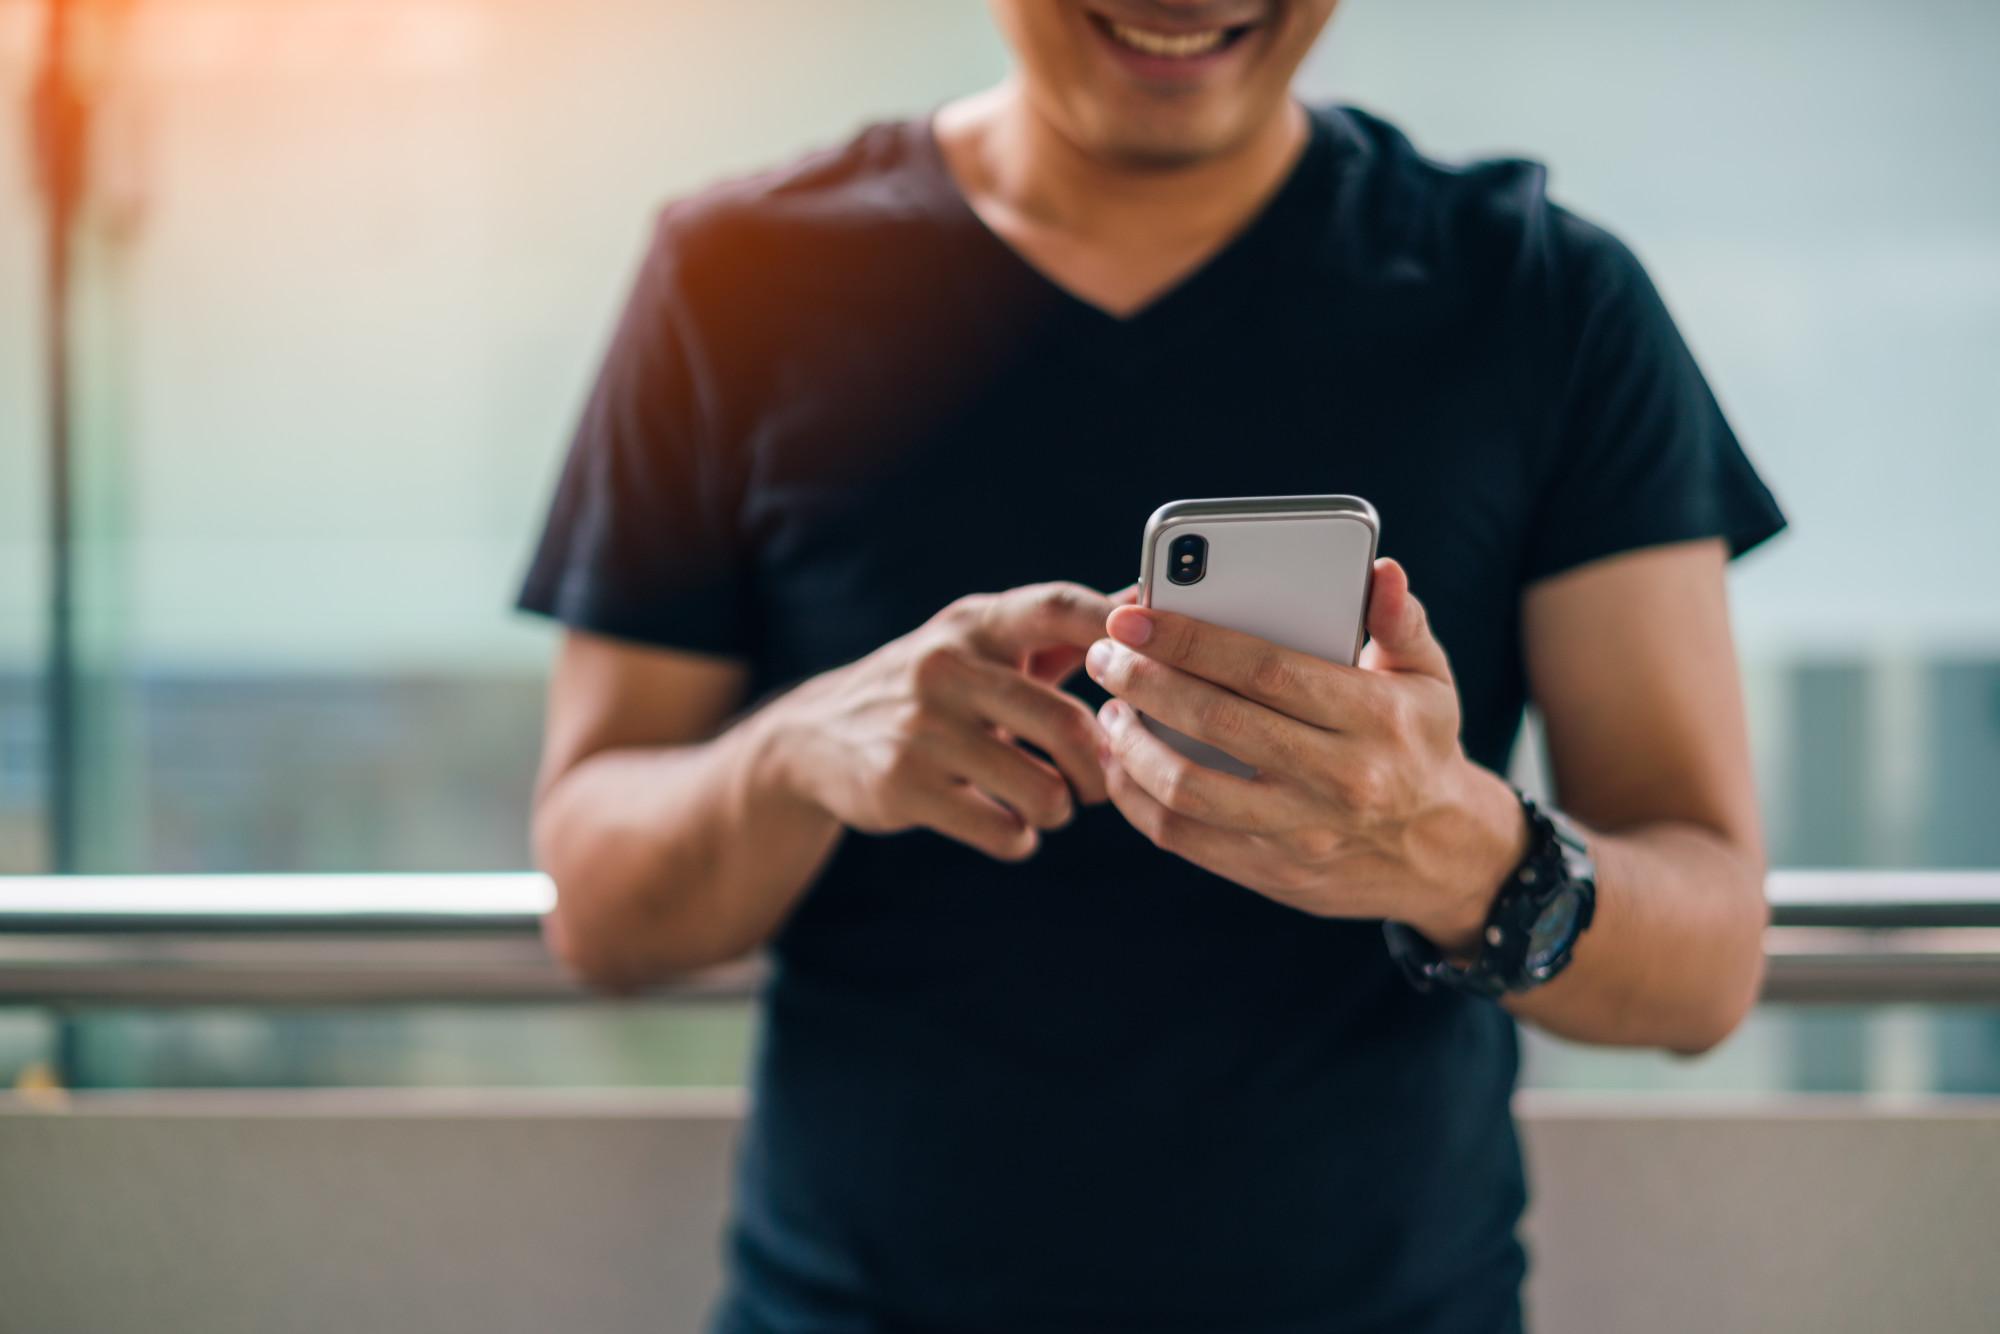 Man using an iPhone